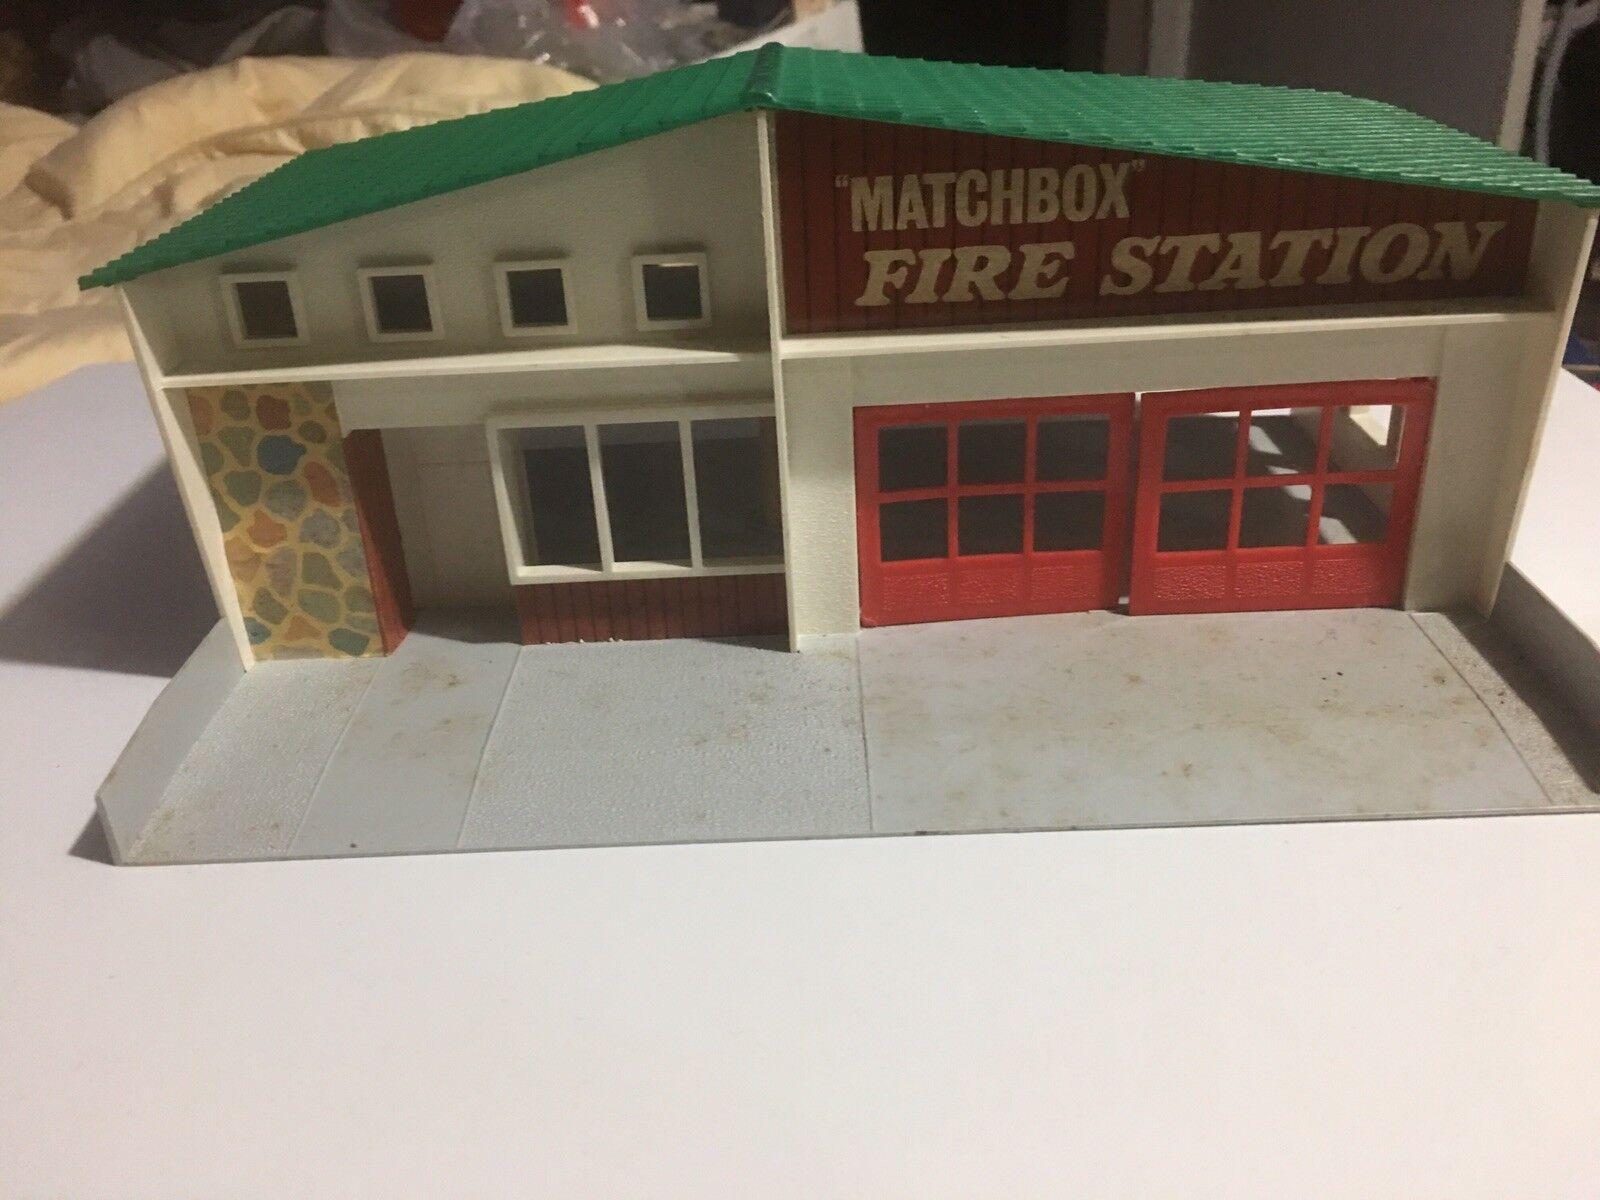 MATCHBOX LESNEY ACCESSORY MF-1b Fire Station RARE toit vert Net Comme neuf in ou BOX